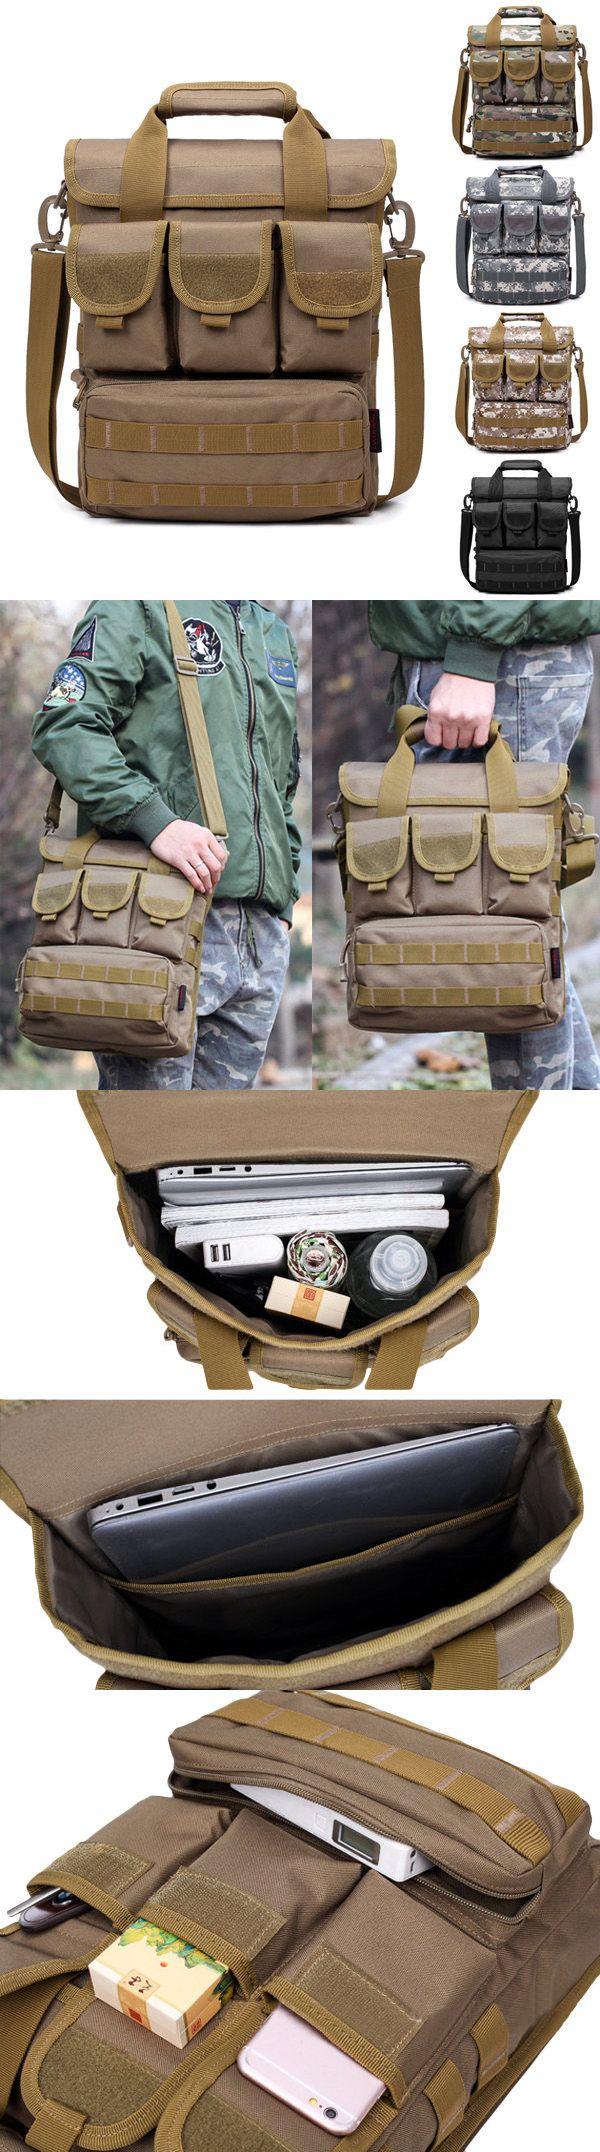 $22.28 Outdoor Sports Hiking Multi-pocket large capacity Sling Bag Handbag For Men